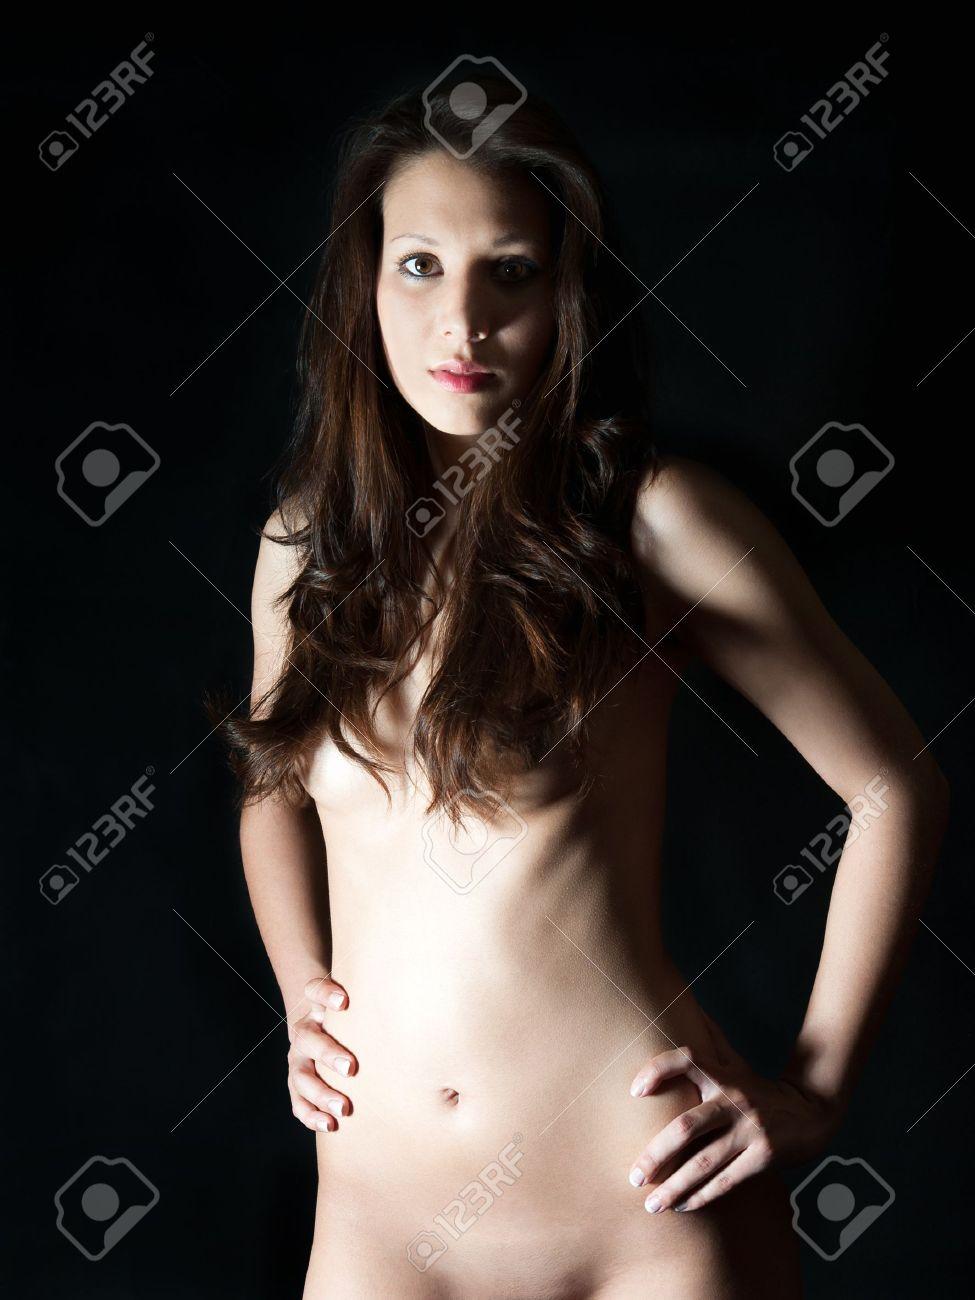 Xmoms huge tits handjob